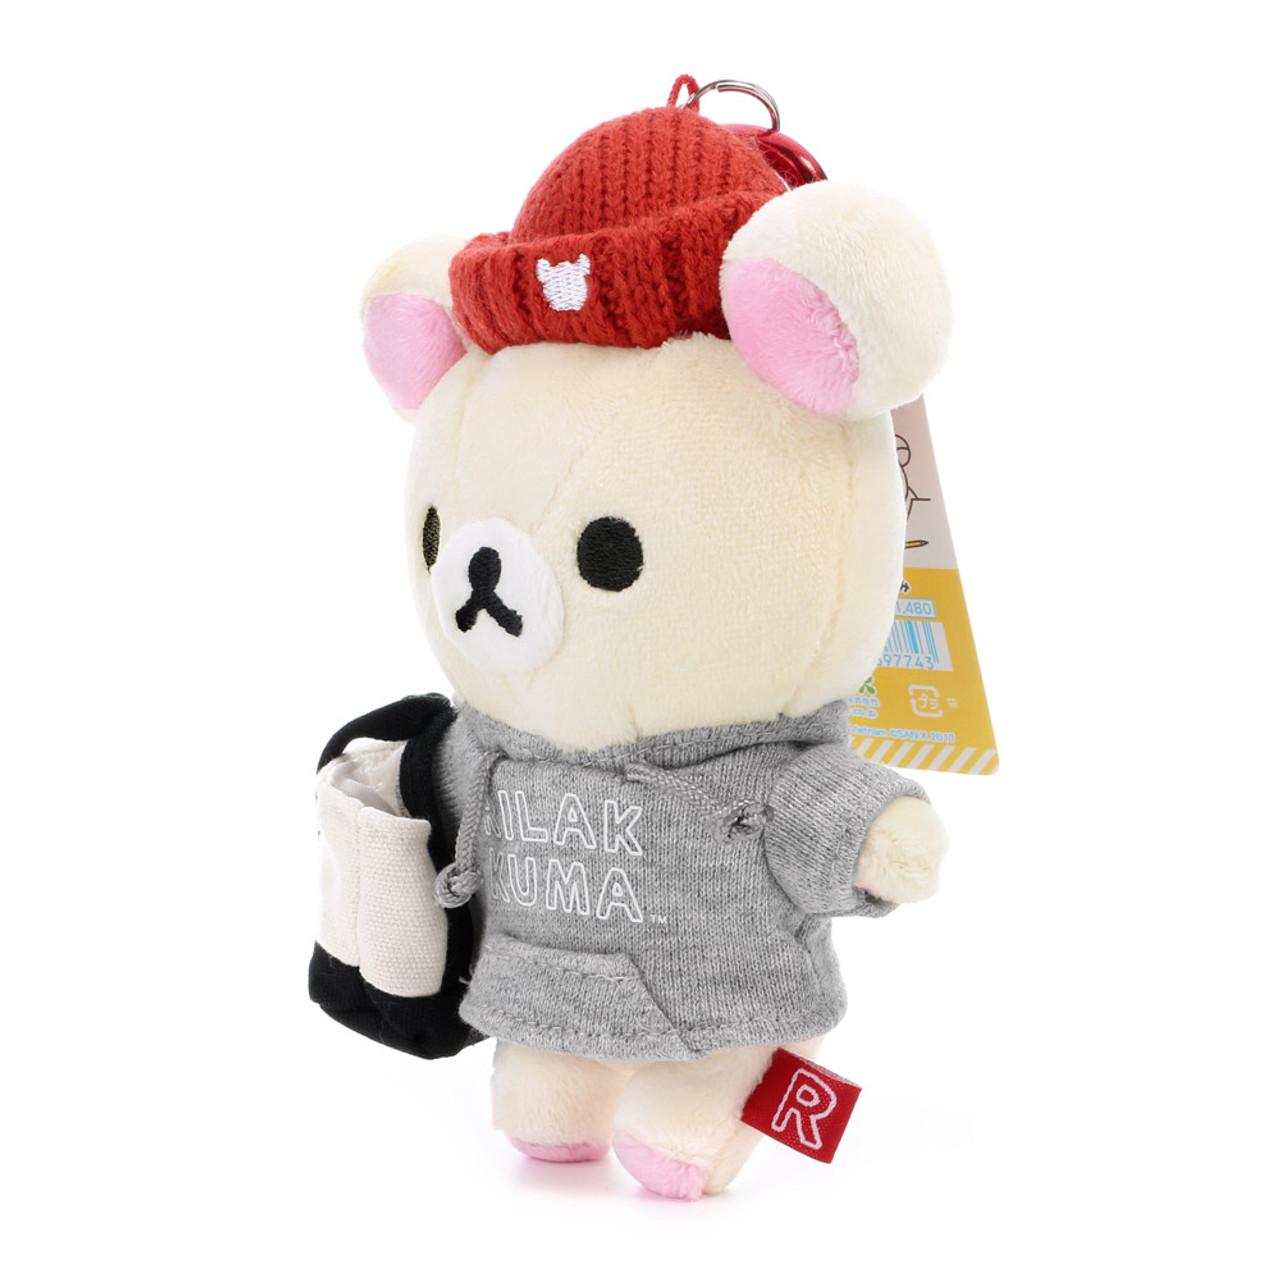 Korilakkuma Plush Doll Sleeping Bag Strawberry San-X Japan Rilakkuma